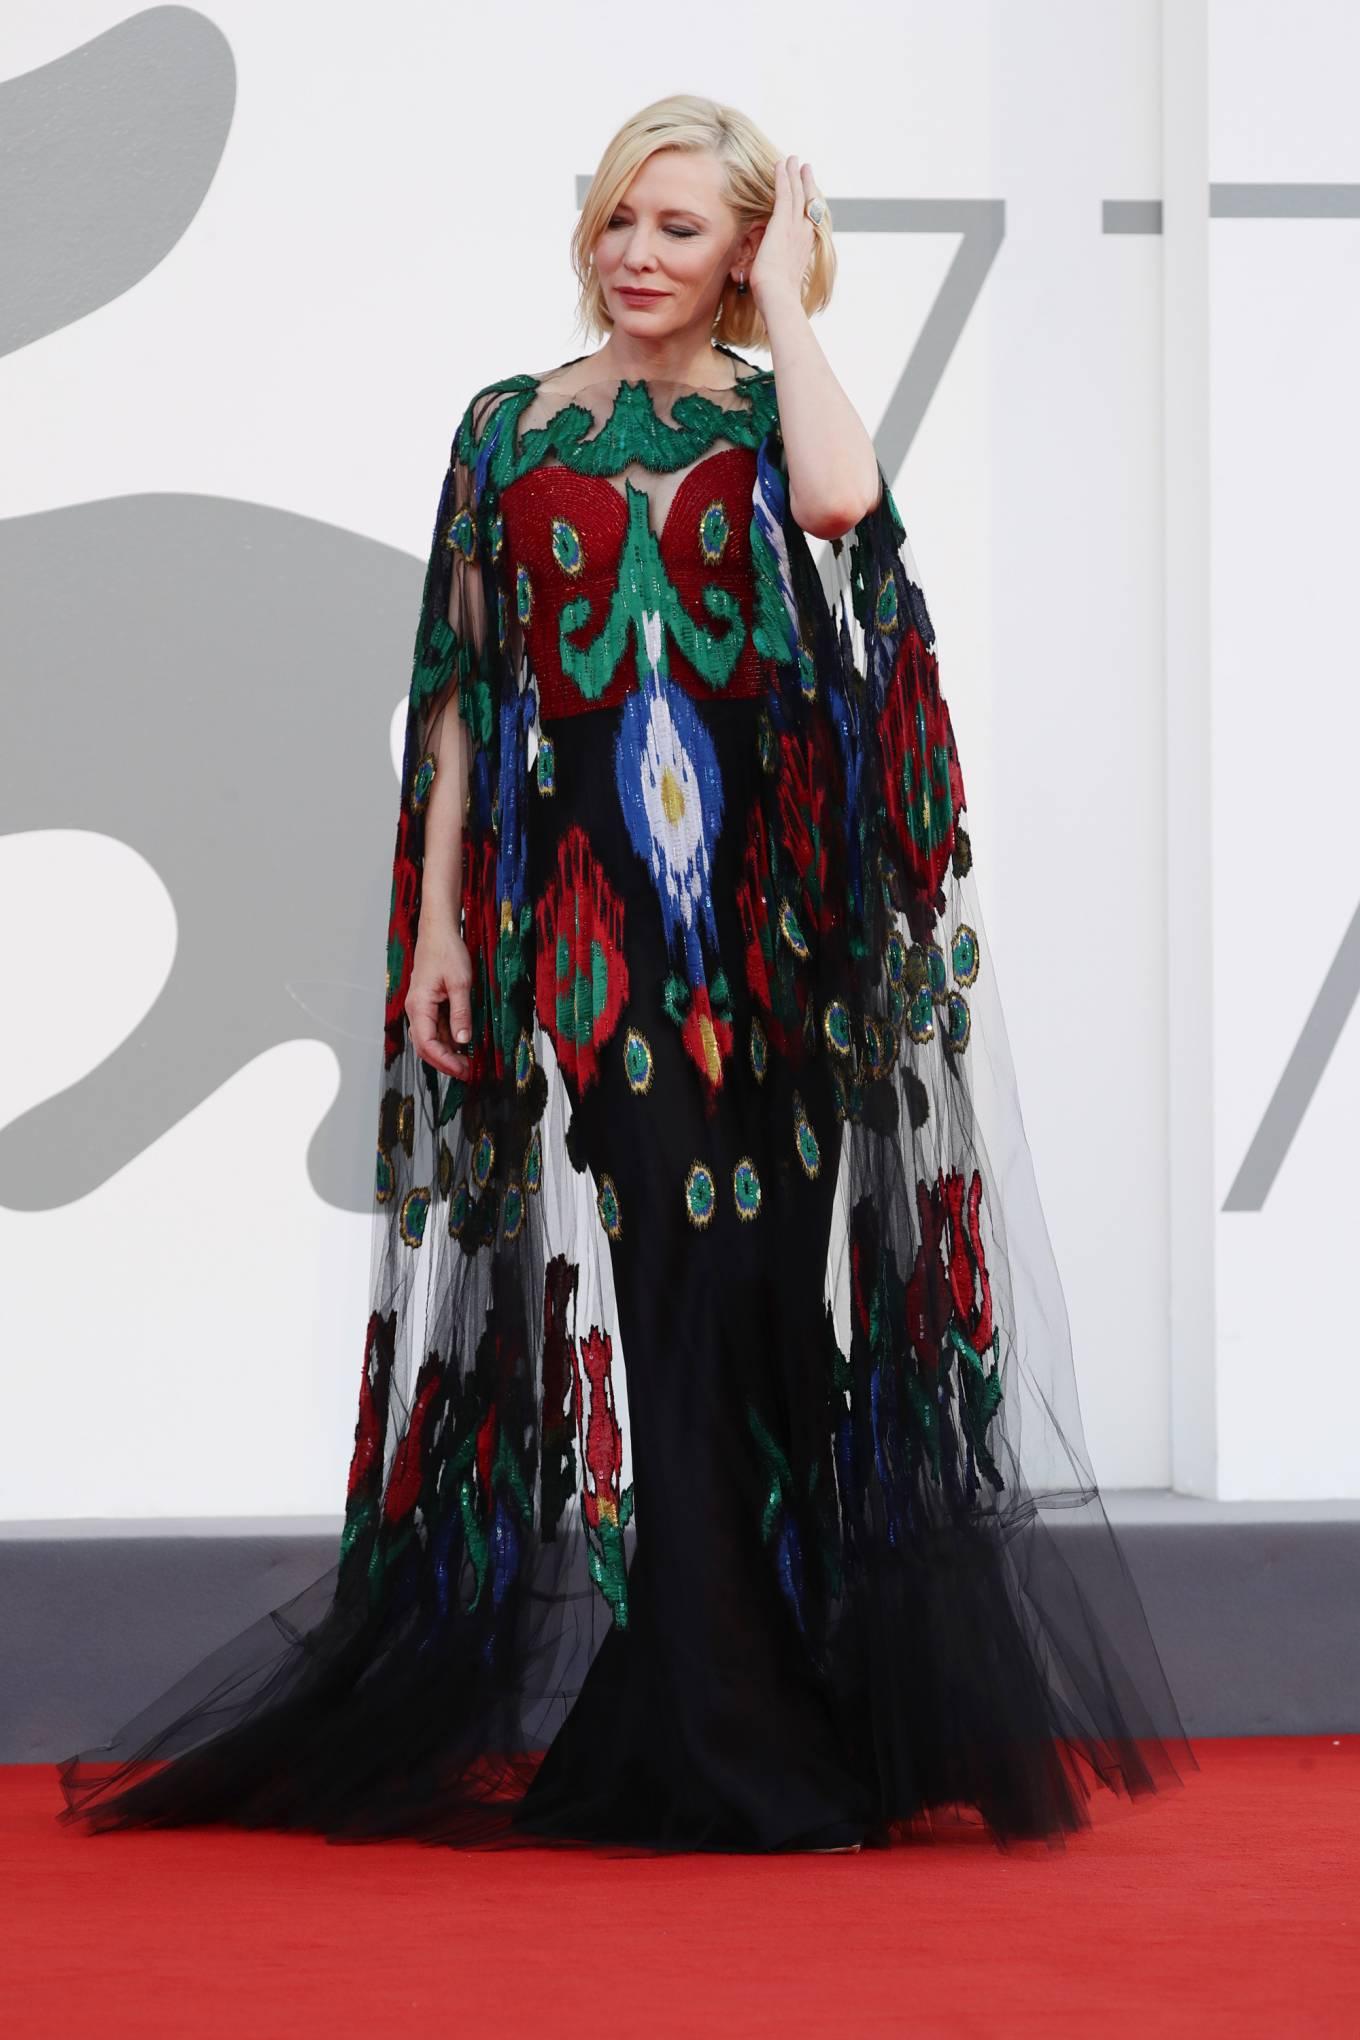 Cate Blanchett 2020 : Cate Blanchett – Closing Ceremony Red Carpet of 2020 Venice Film Festival in Venice-03